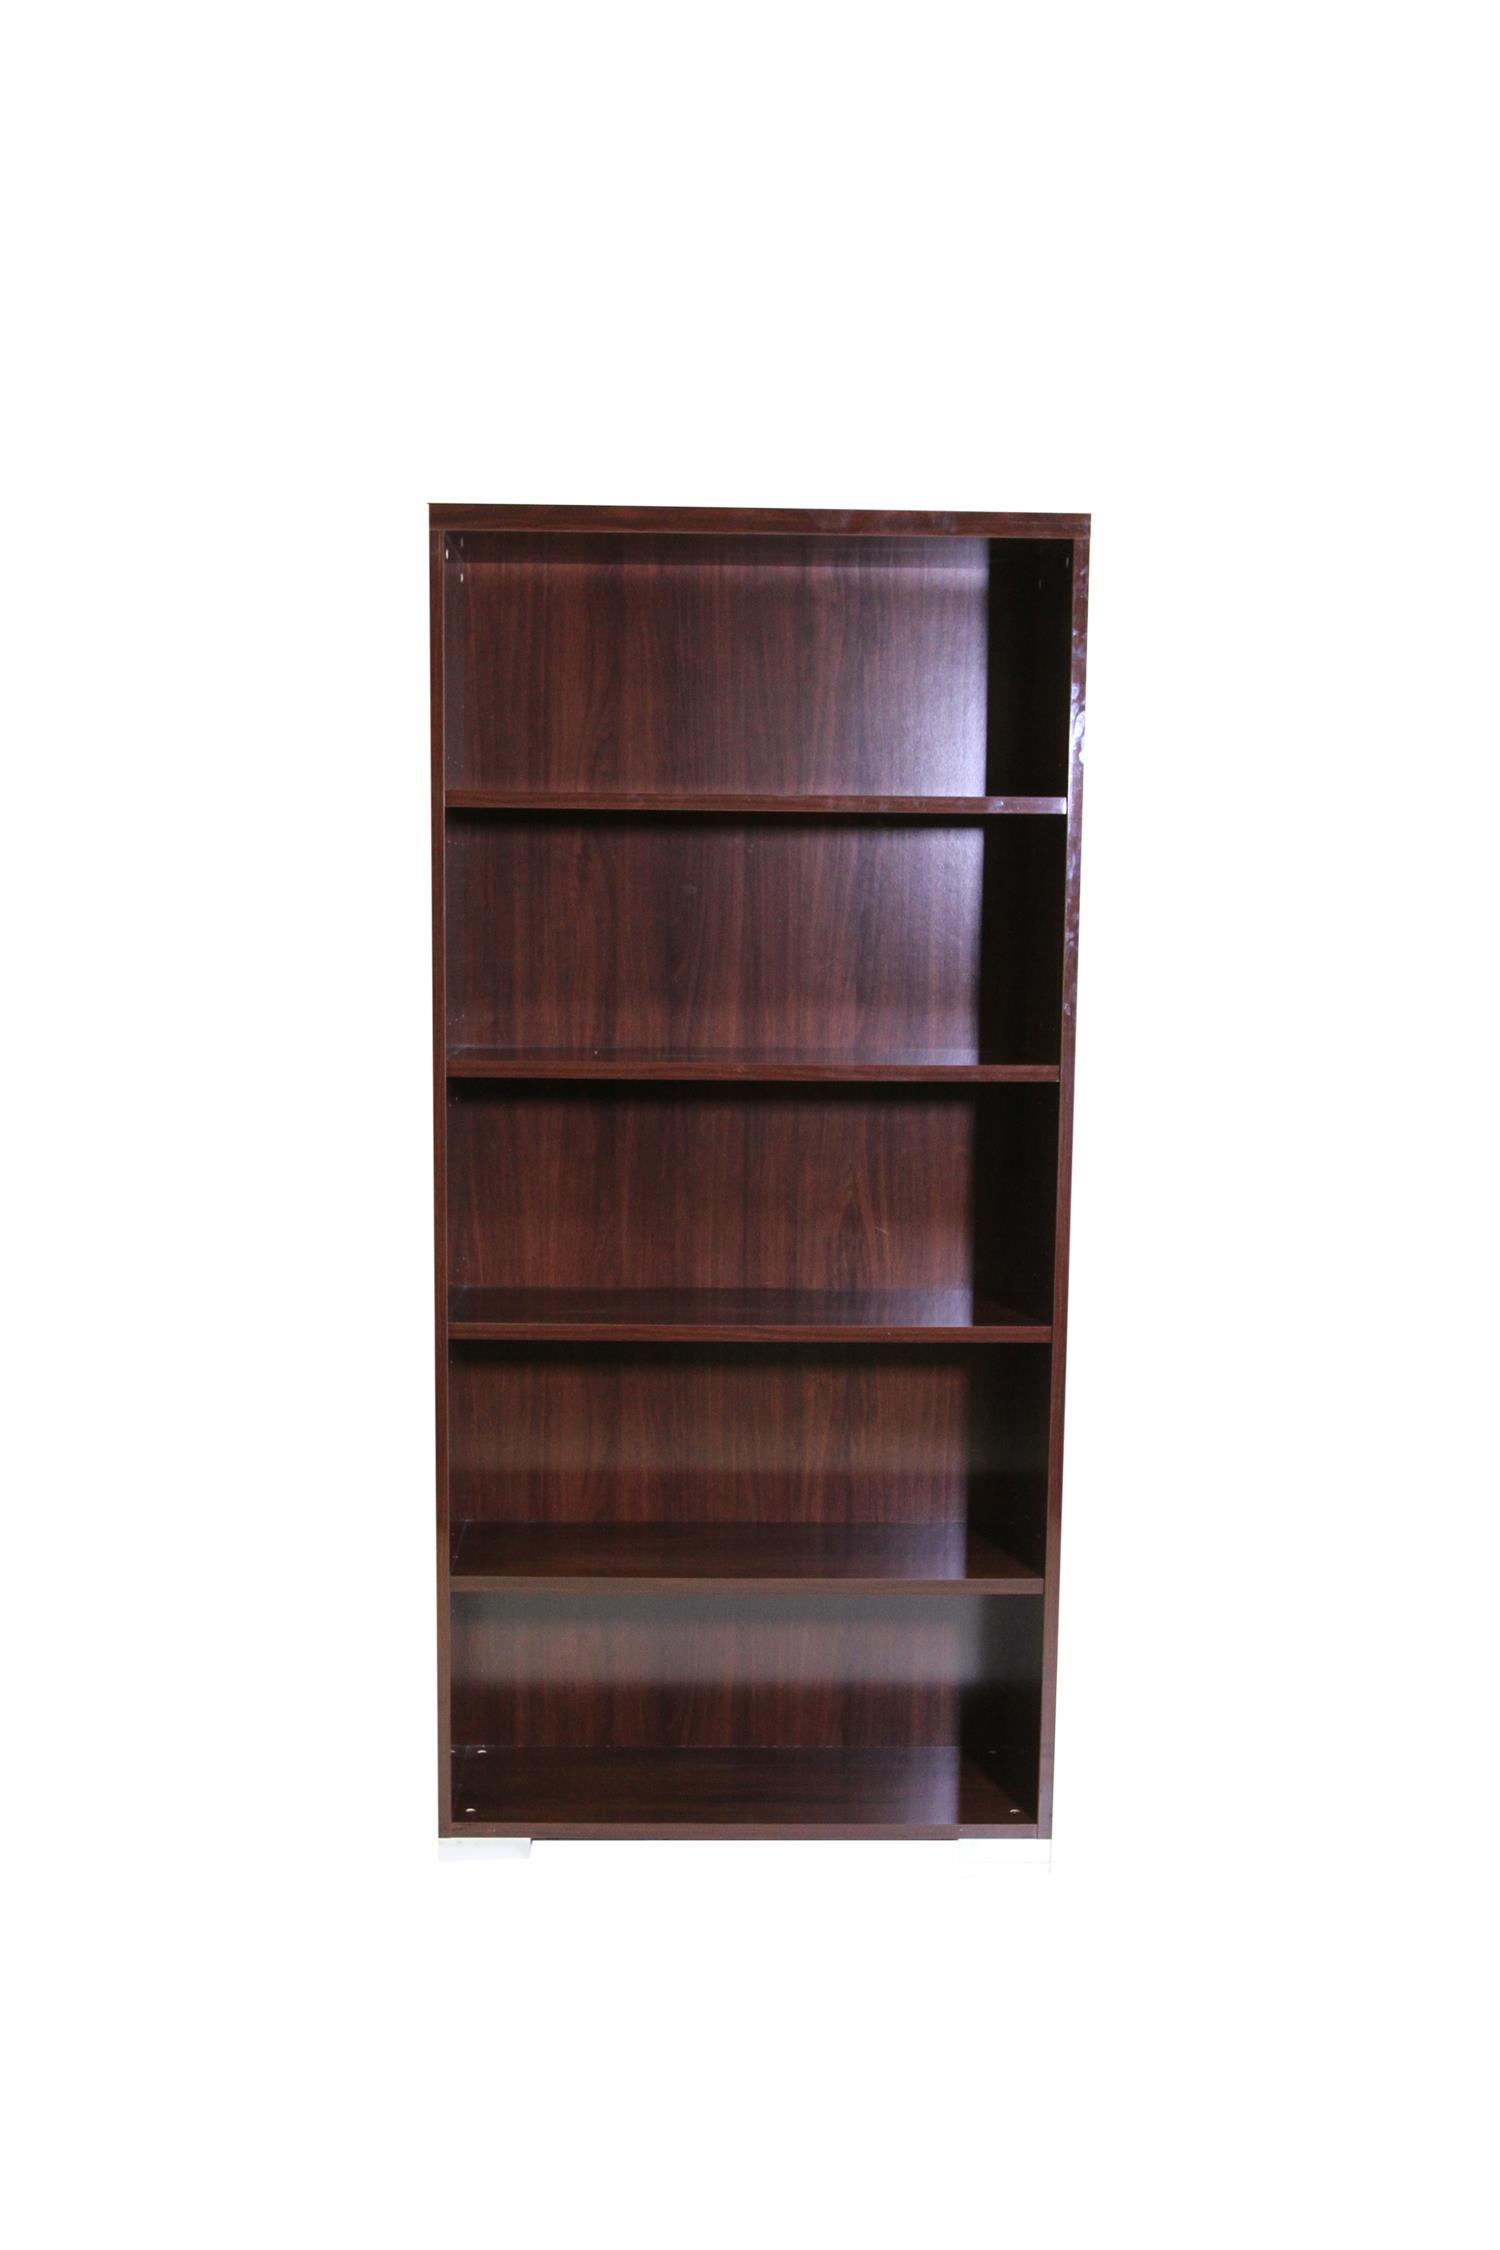 Pisa Bookcase by Alf Italia at HomeWorld Furniture